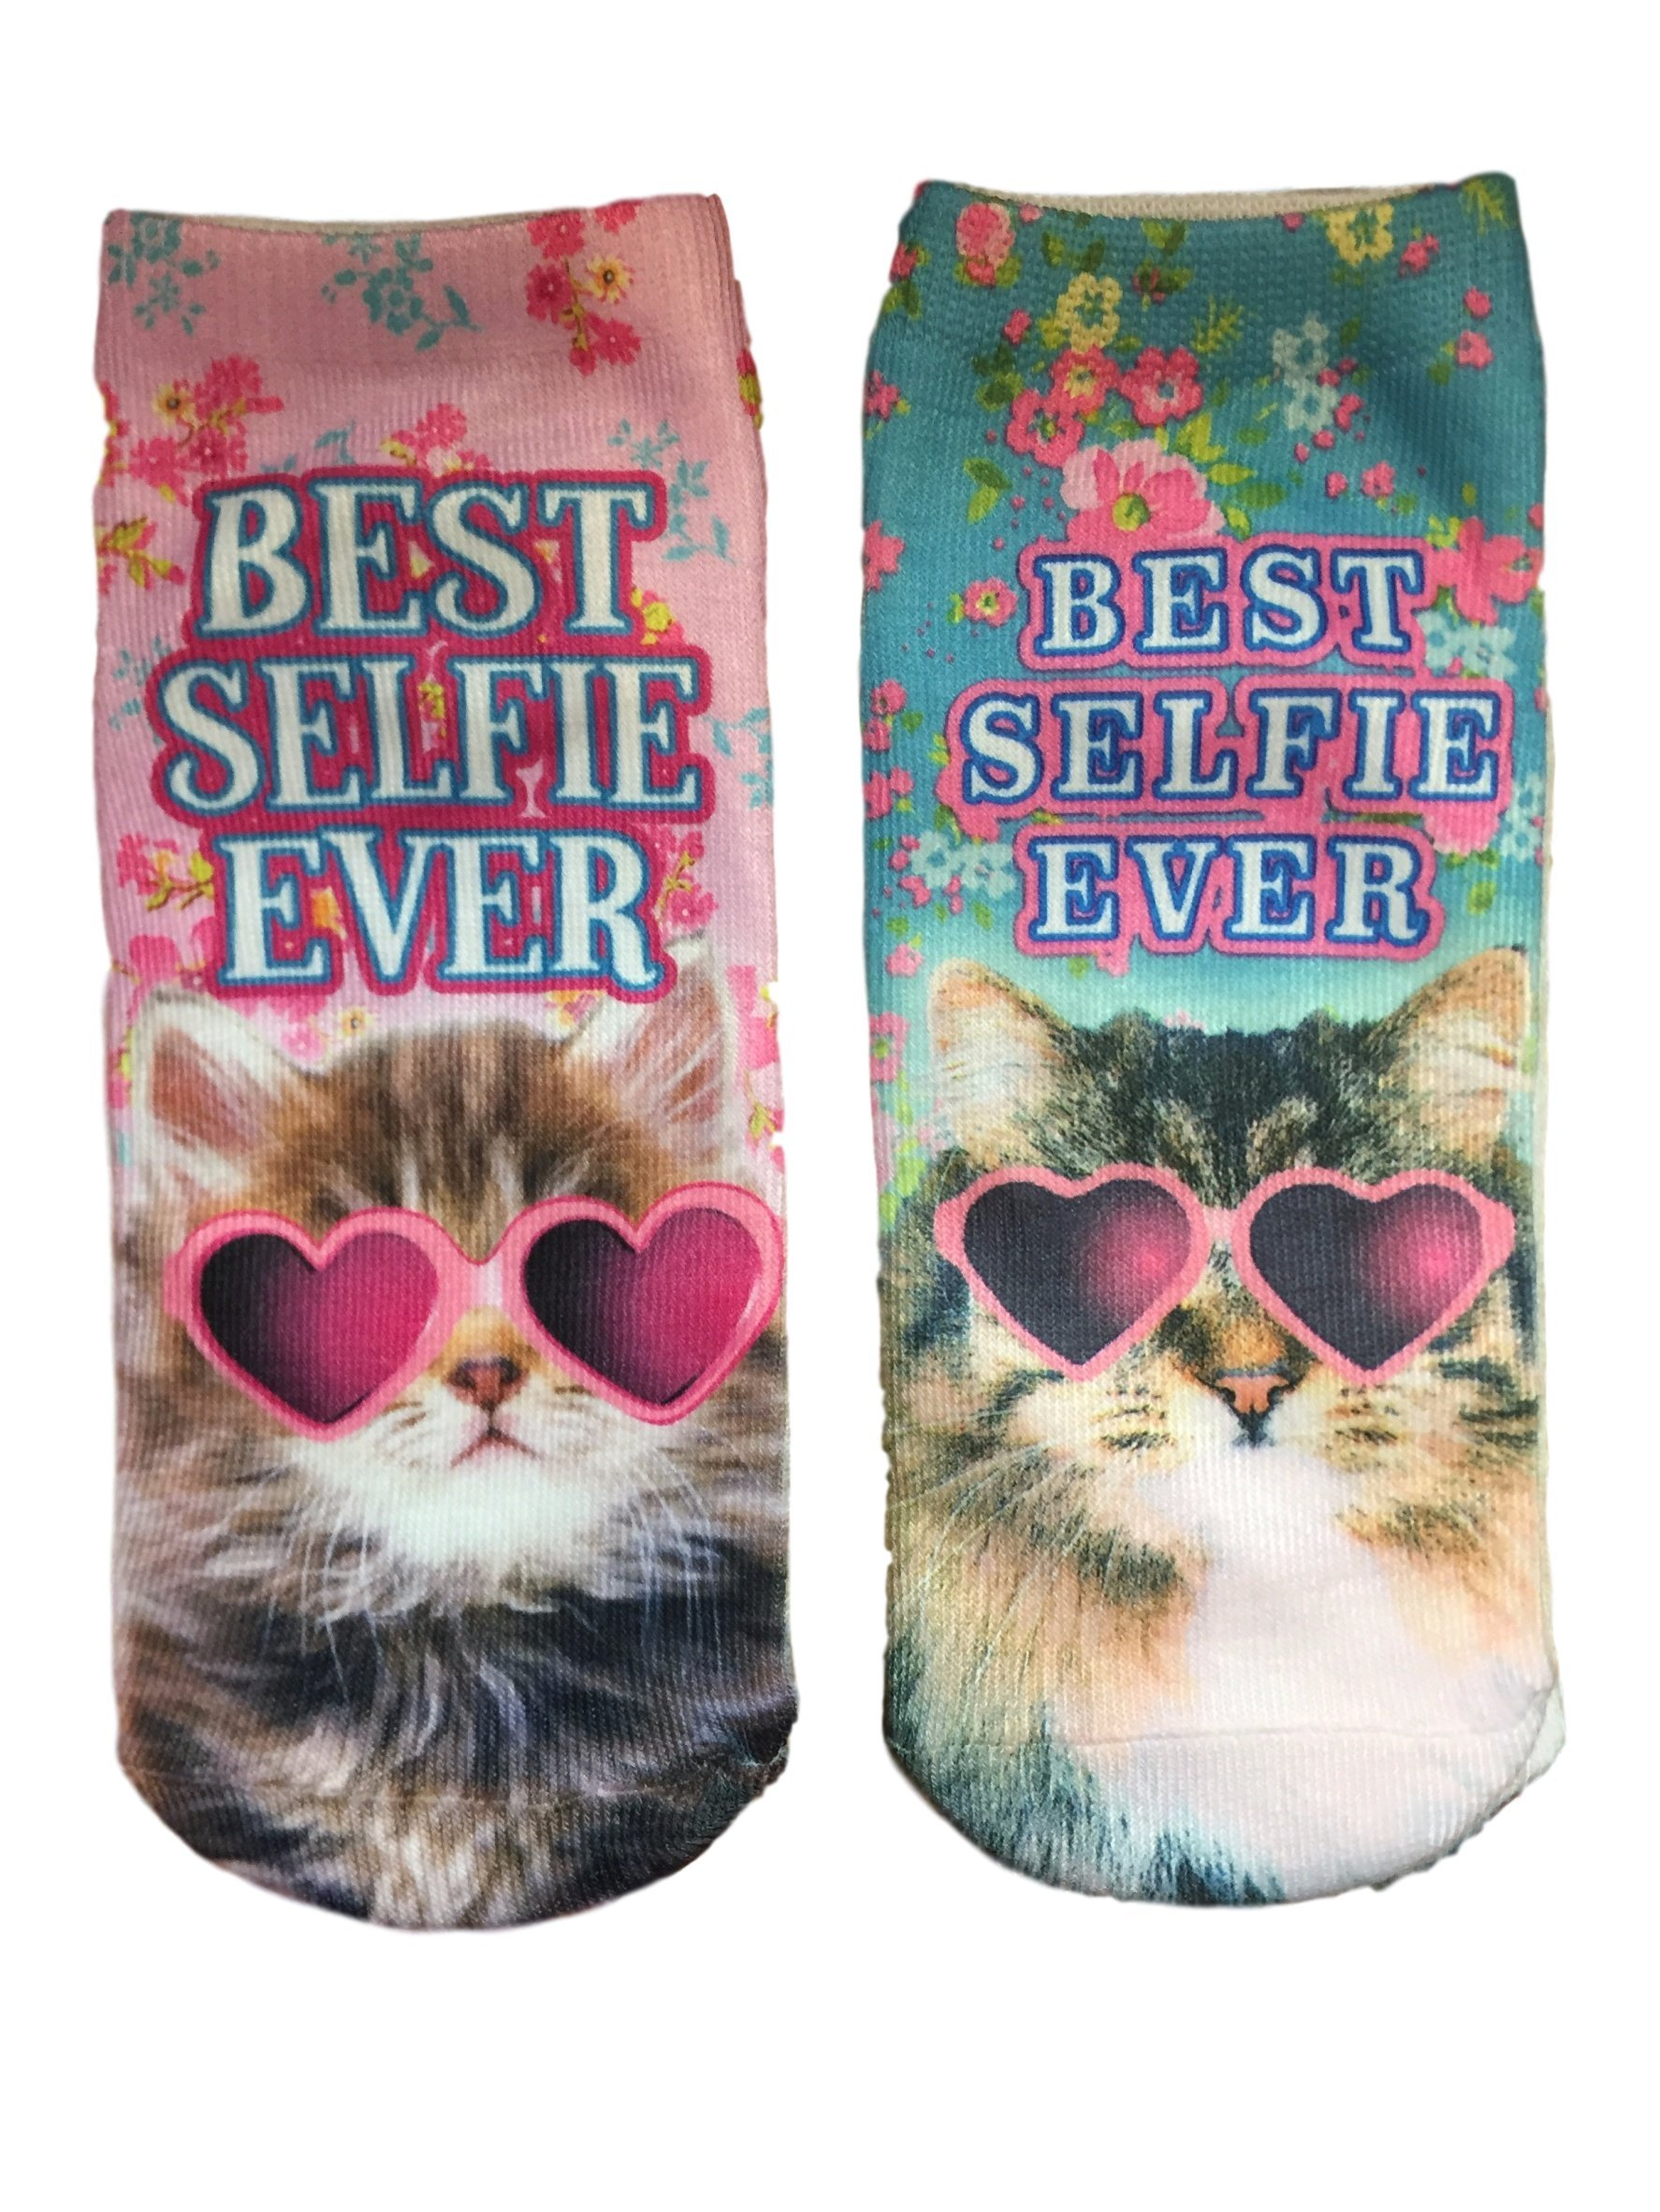 HARAJUKU Printed Socks Best Selfie Ever Cat in Heart Shaped Sunglasses